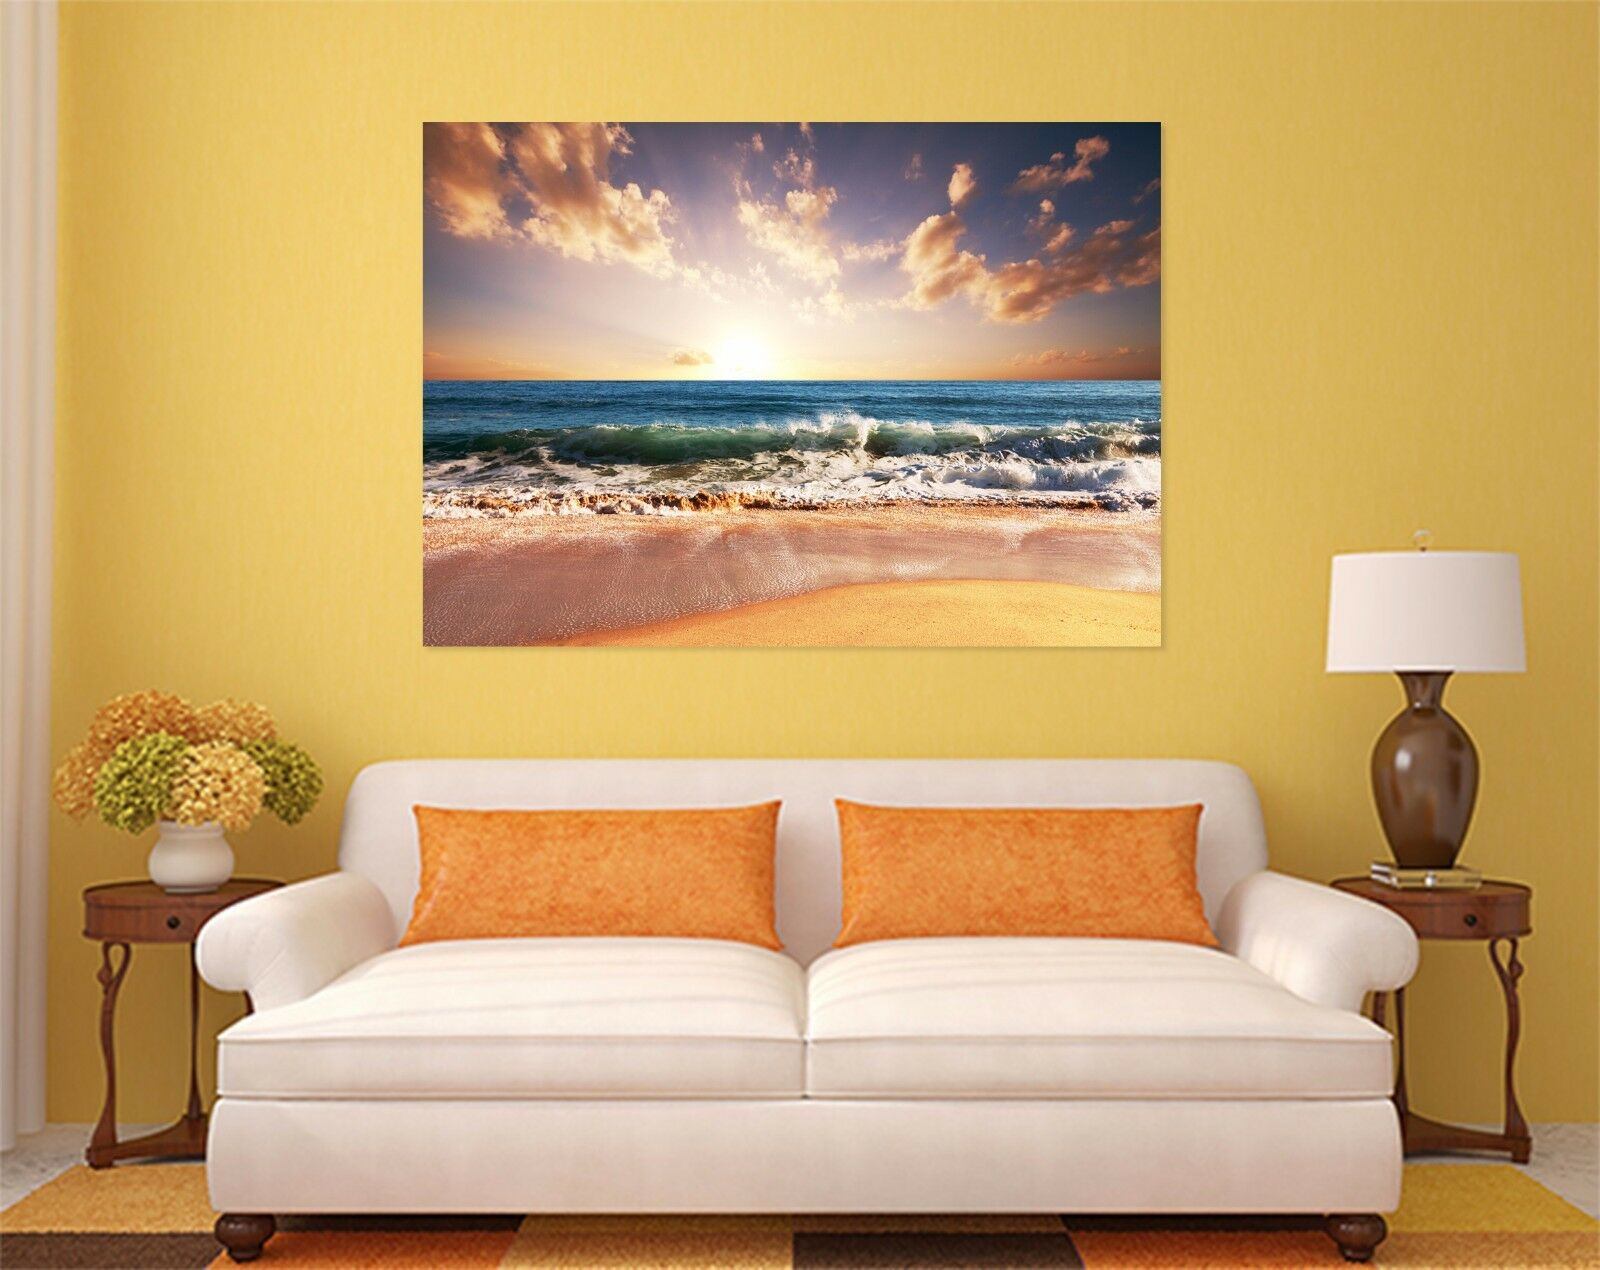 3D Abendred Himmel Meer Welle 7 Fototapeten Wandbild BildTapete AJSTORE DE Lemon